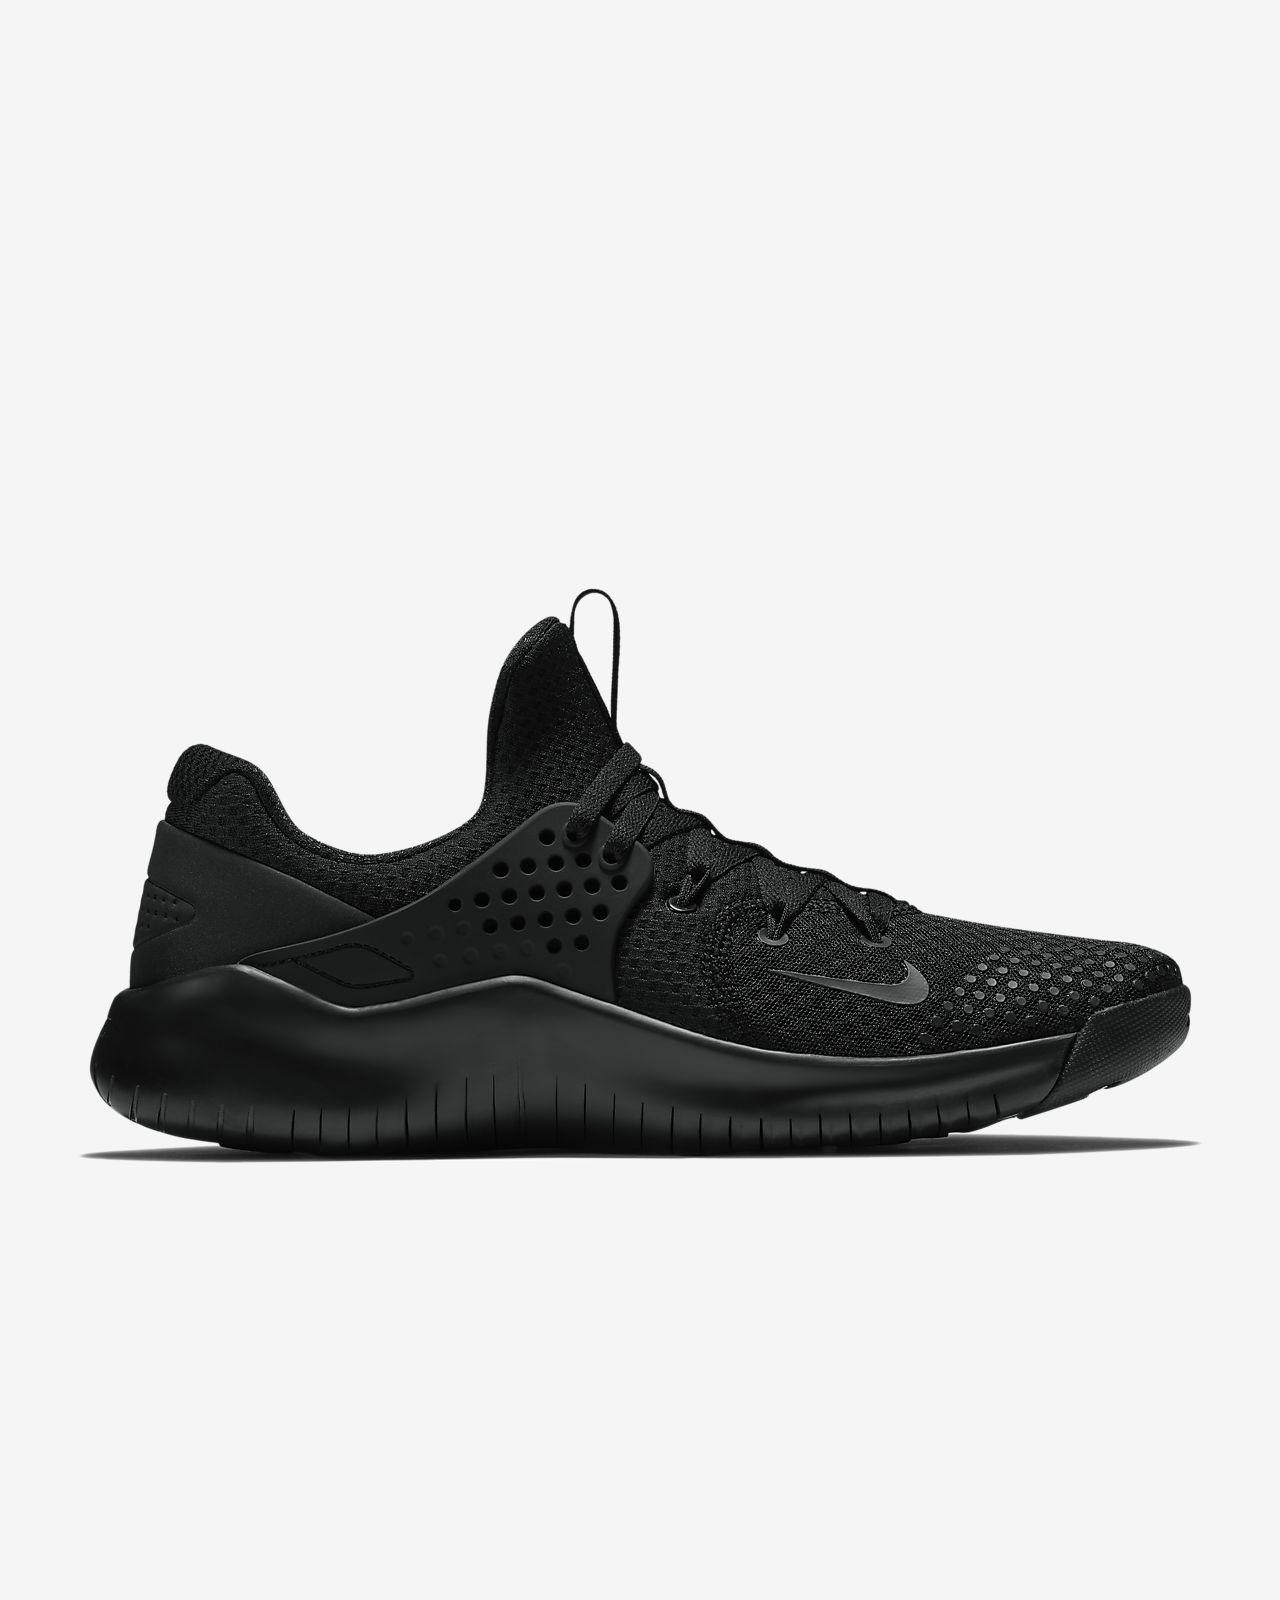 9b8c475f1d58 Nike Free TR V8 Men s Gym HIIT Cross Training Shoe. Nike.com